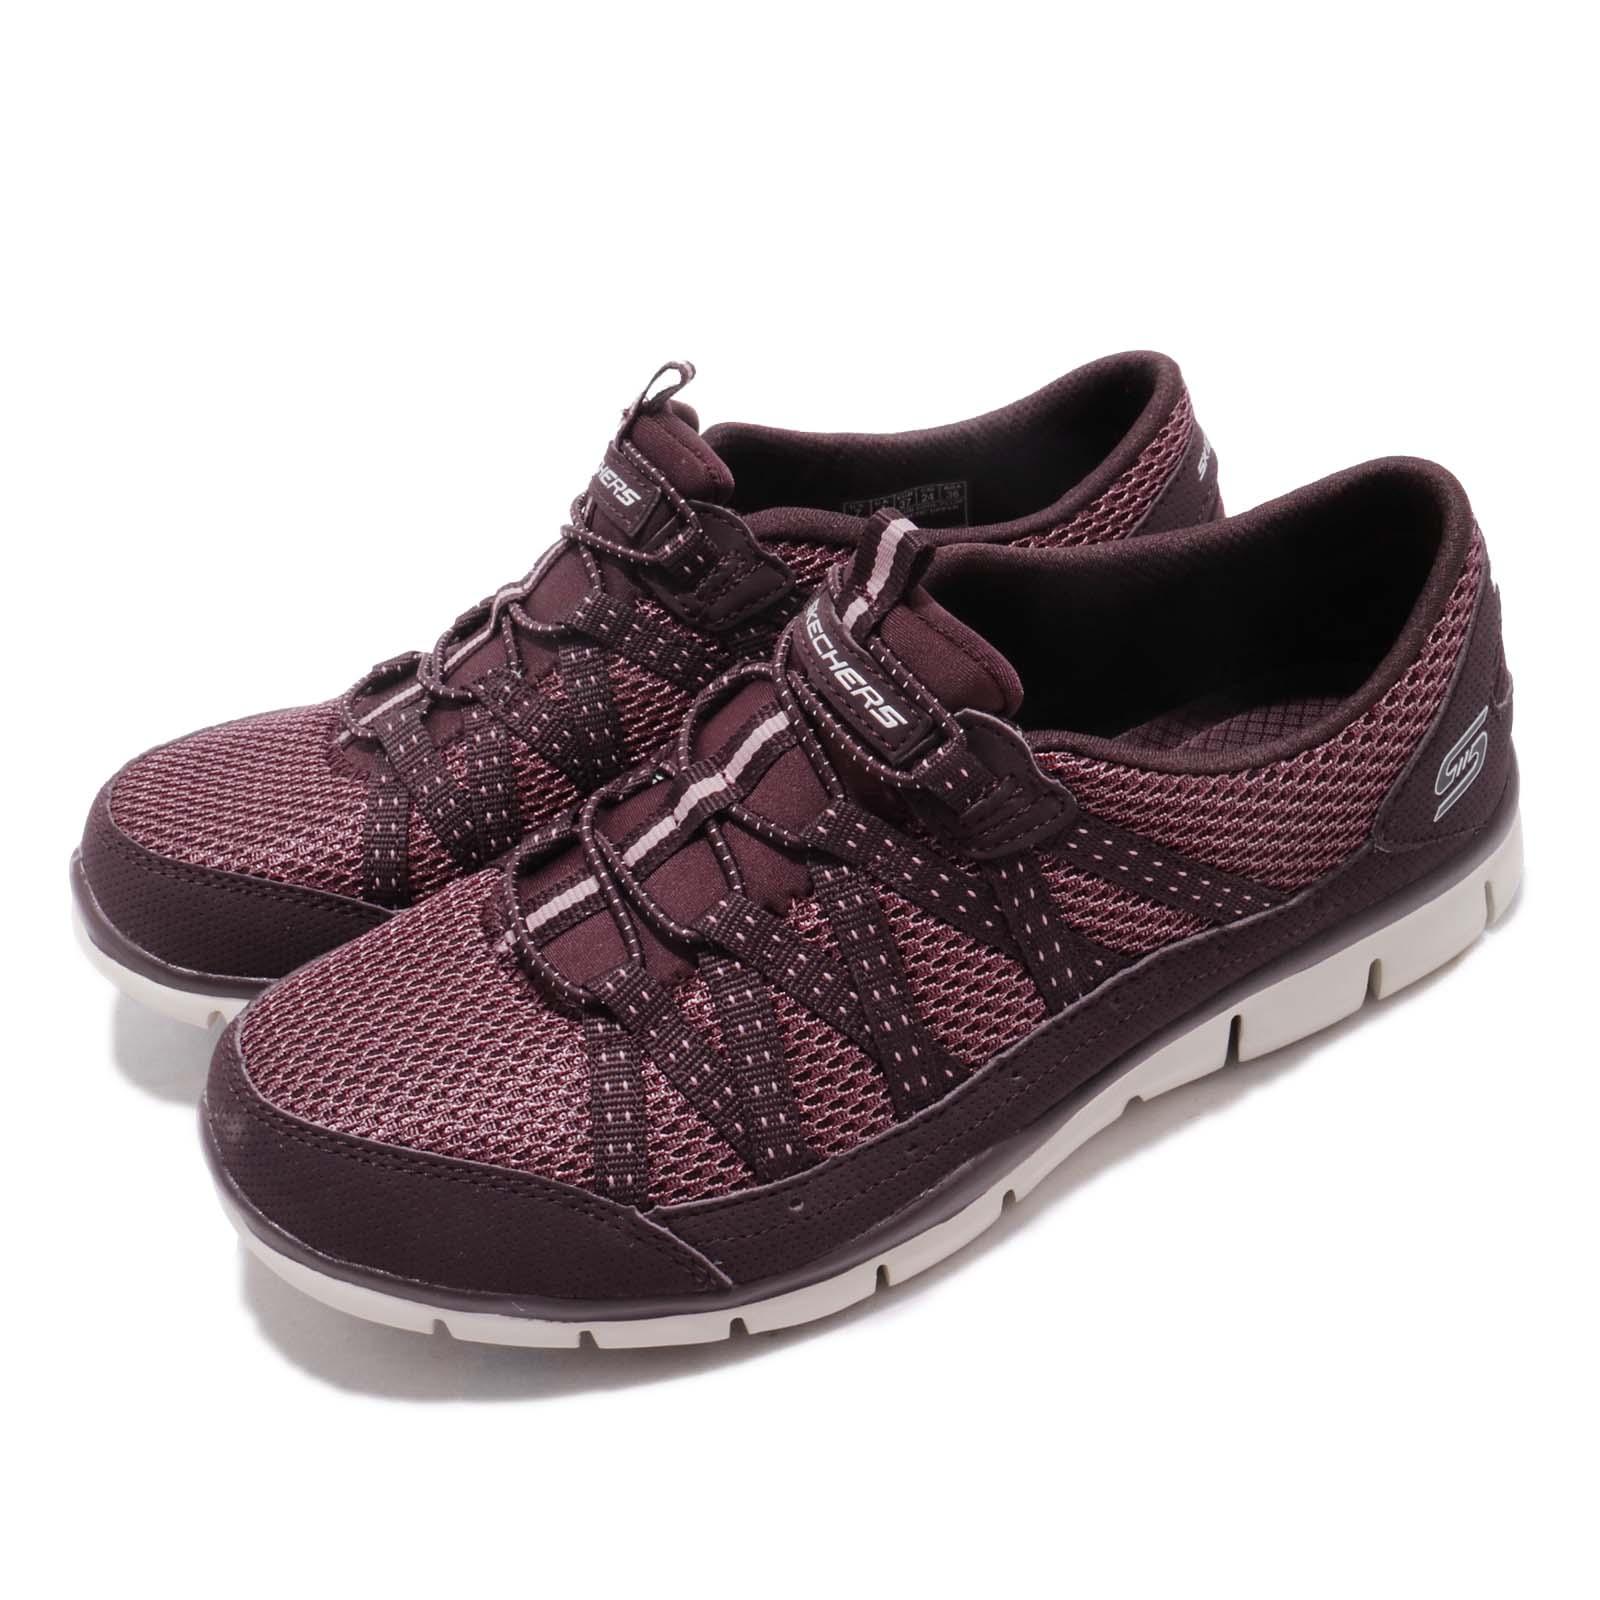 Skechers 健走鞋 Gratis-Strolling 女鞋 22823PLUM